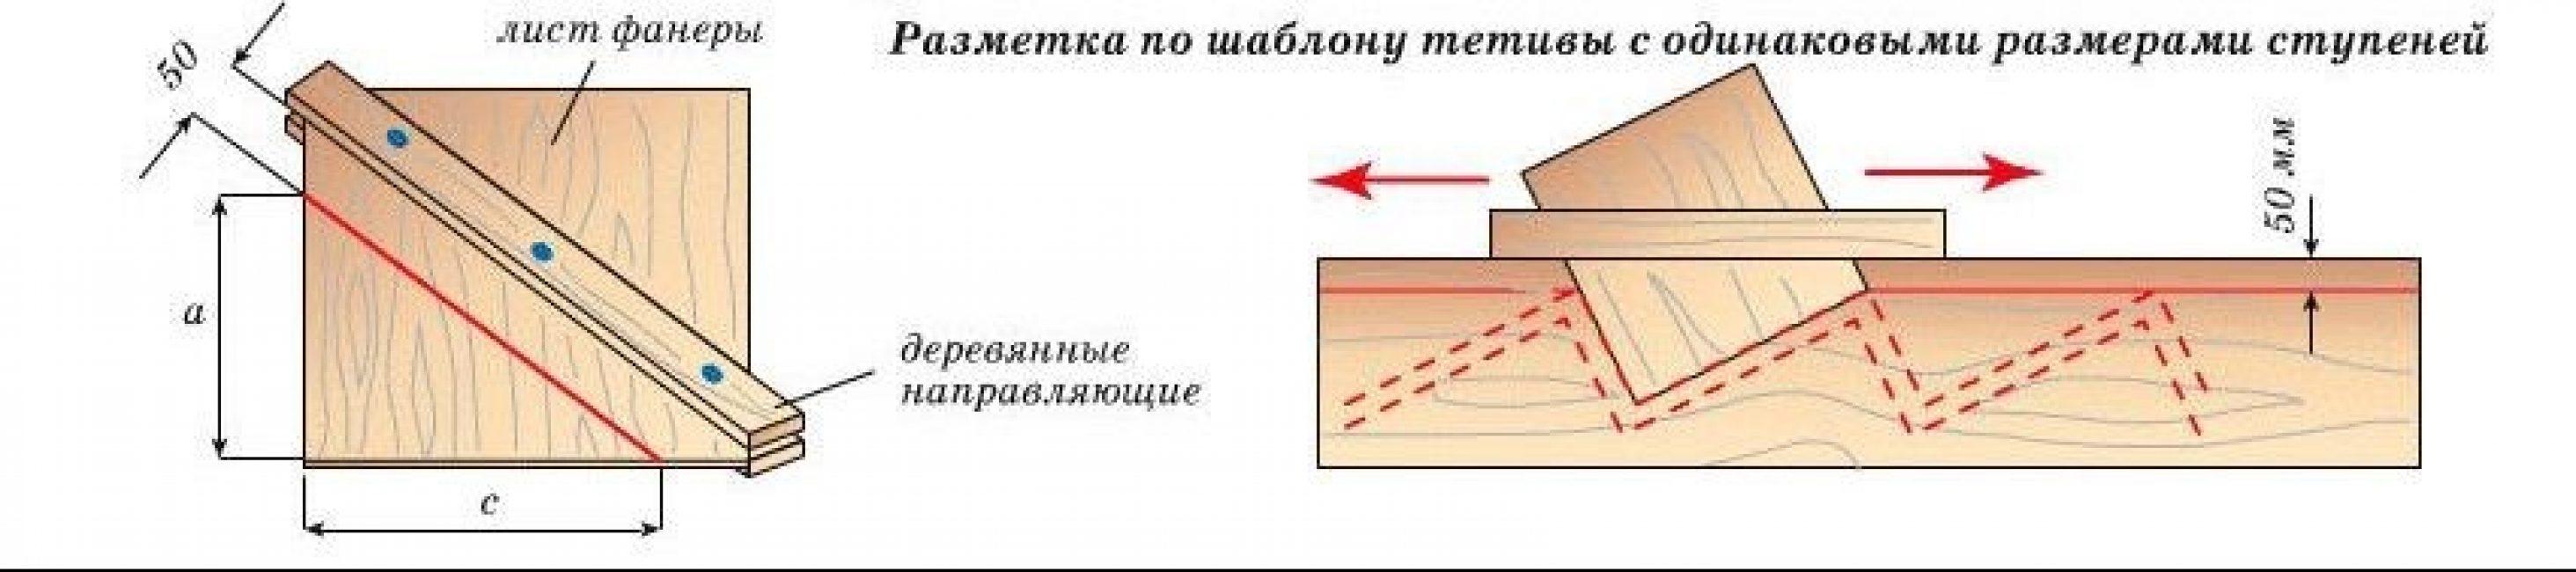 Разметка косоура с помощью шаблона